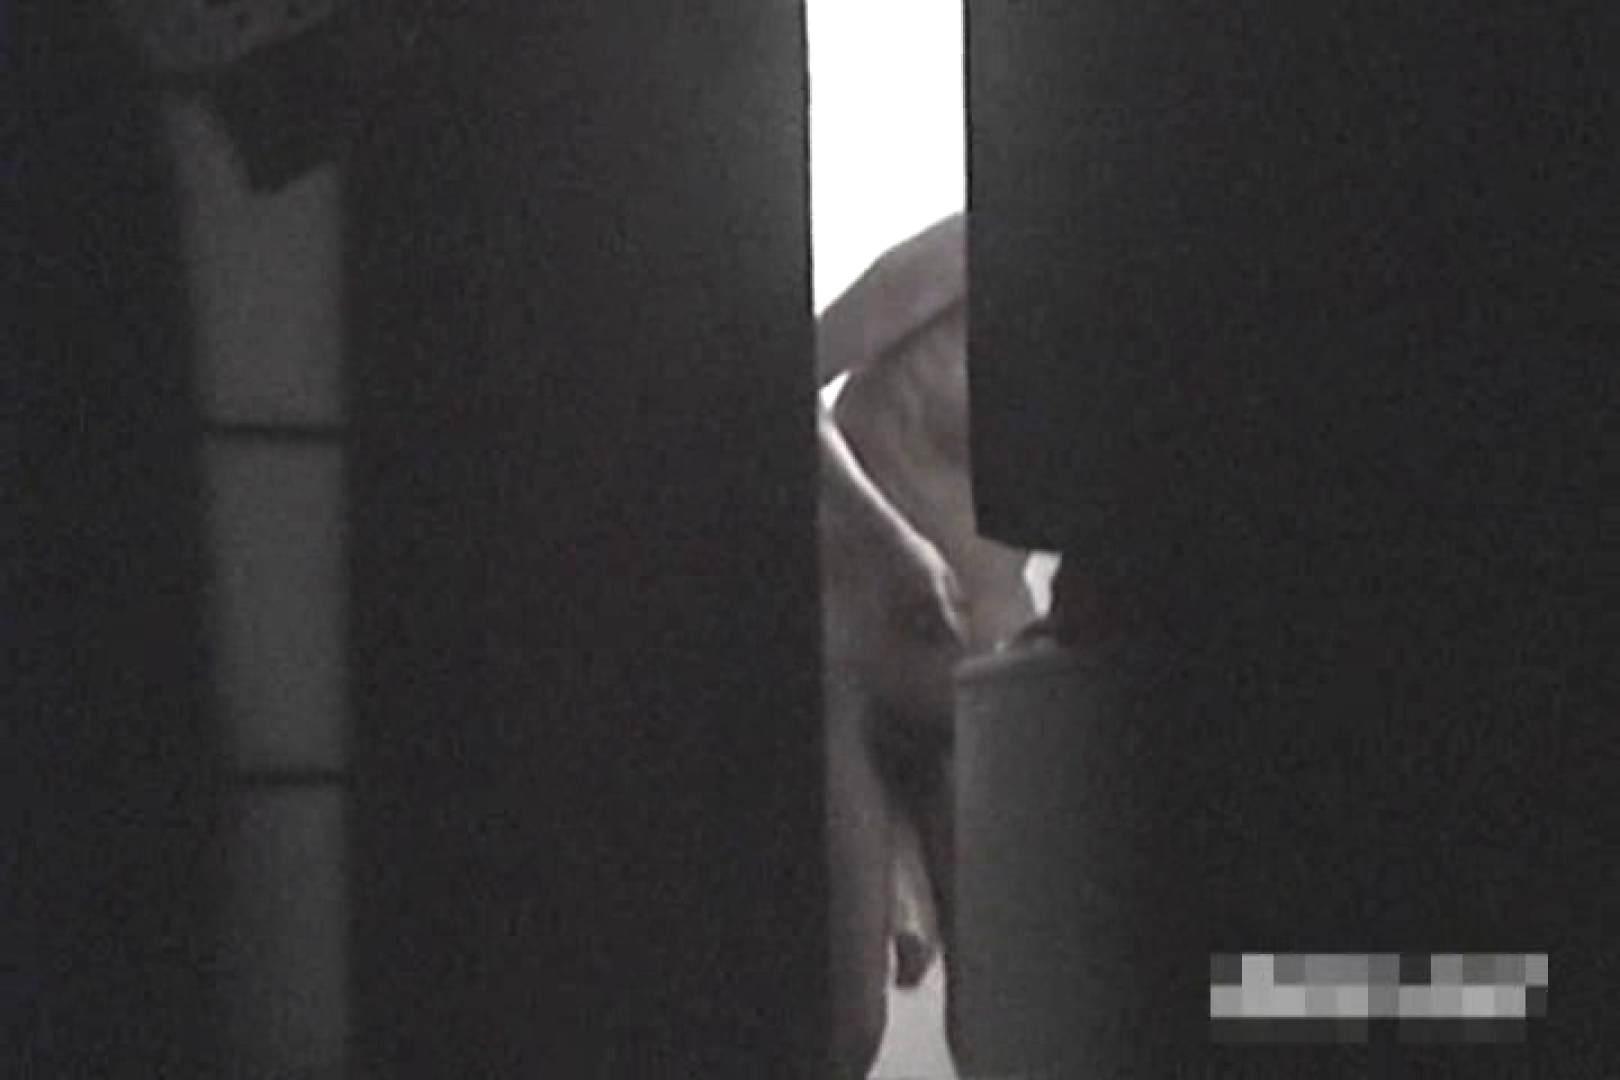 深夜の撮影会Vol.2 盗撮特集 セックス無修正動画無料 95画像 20